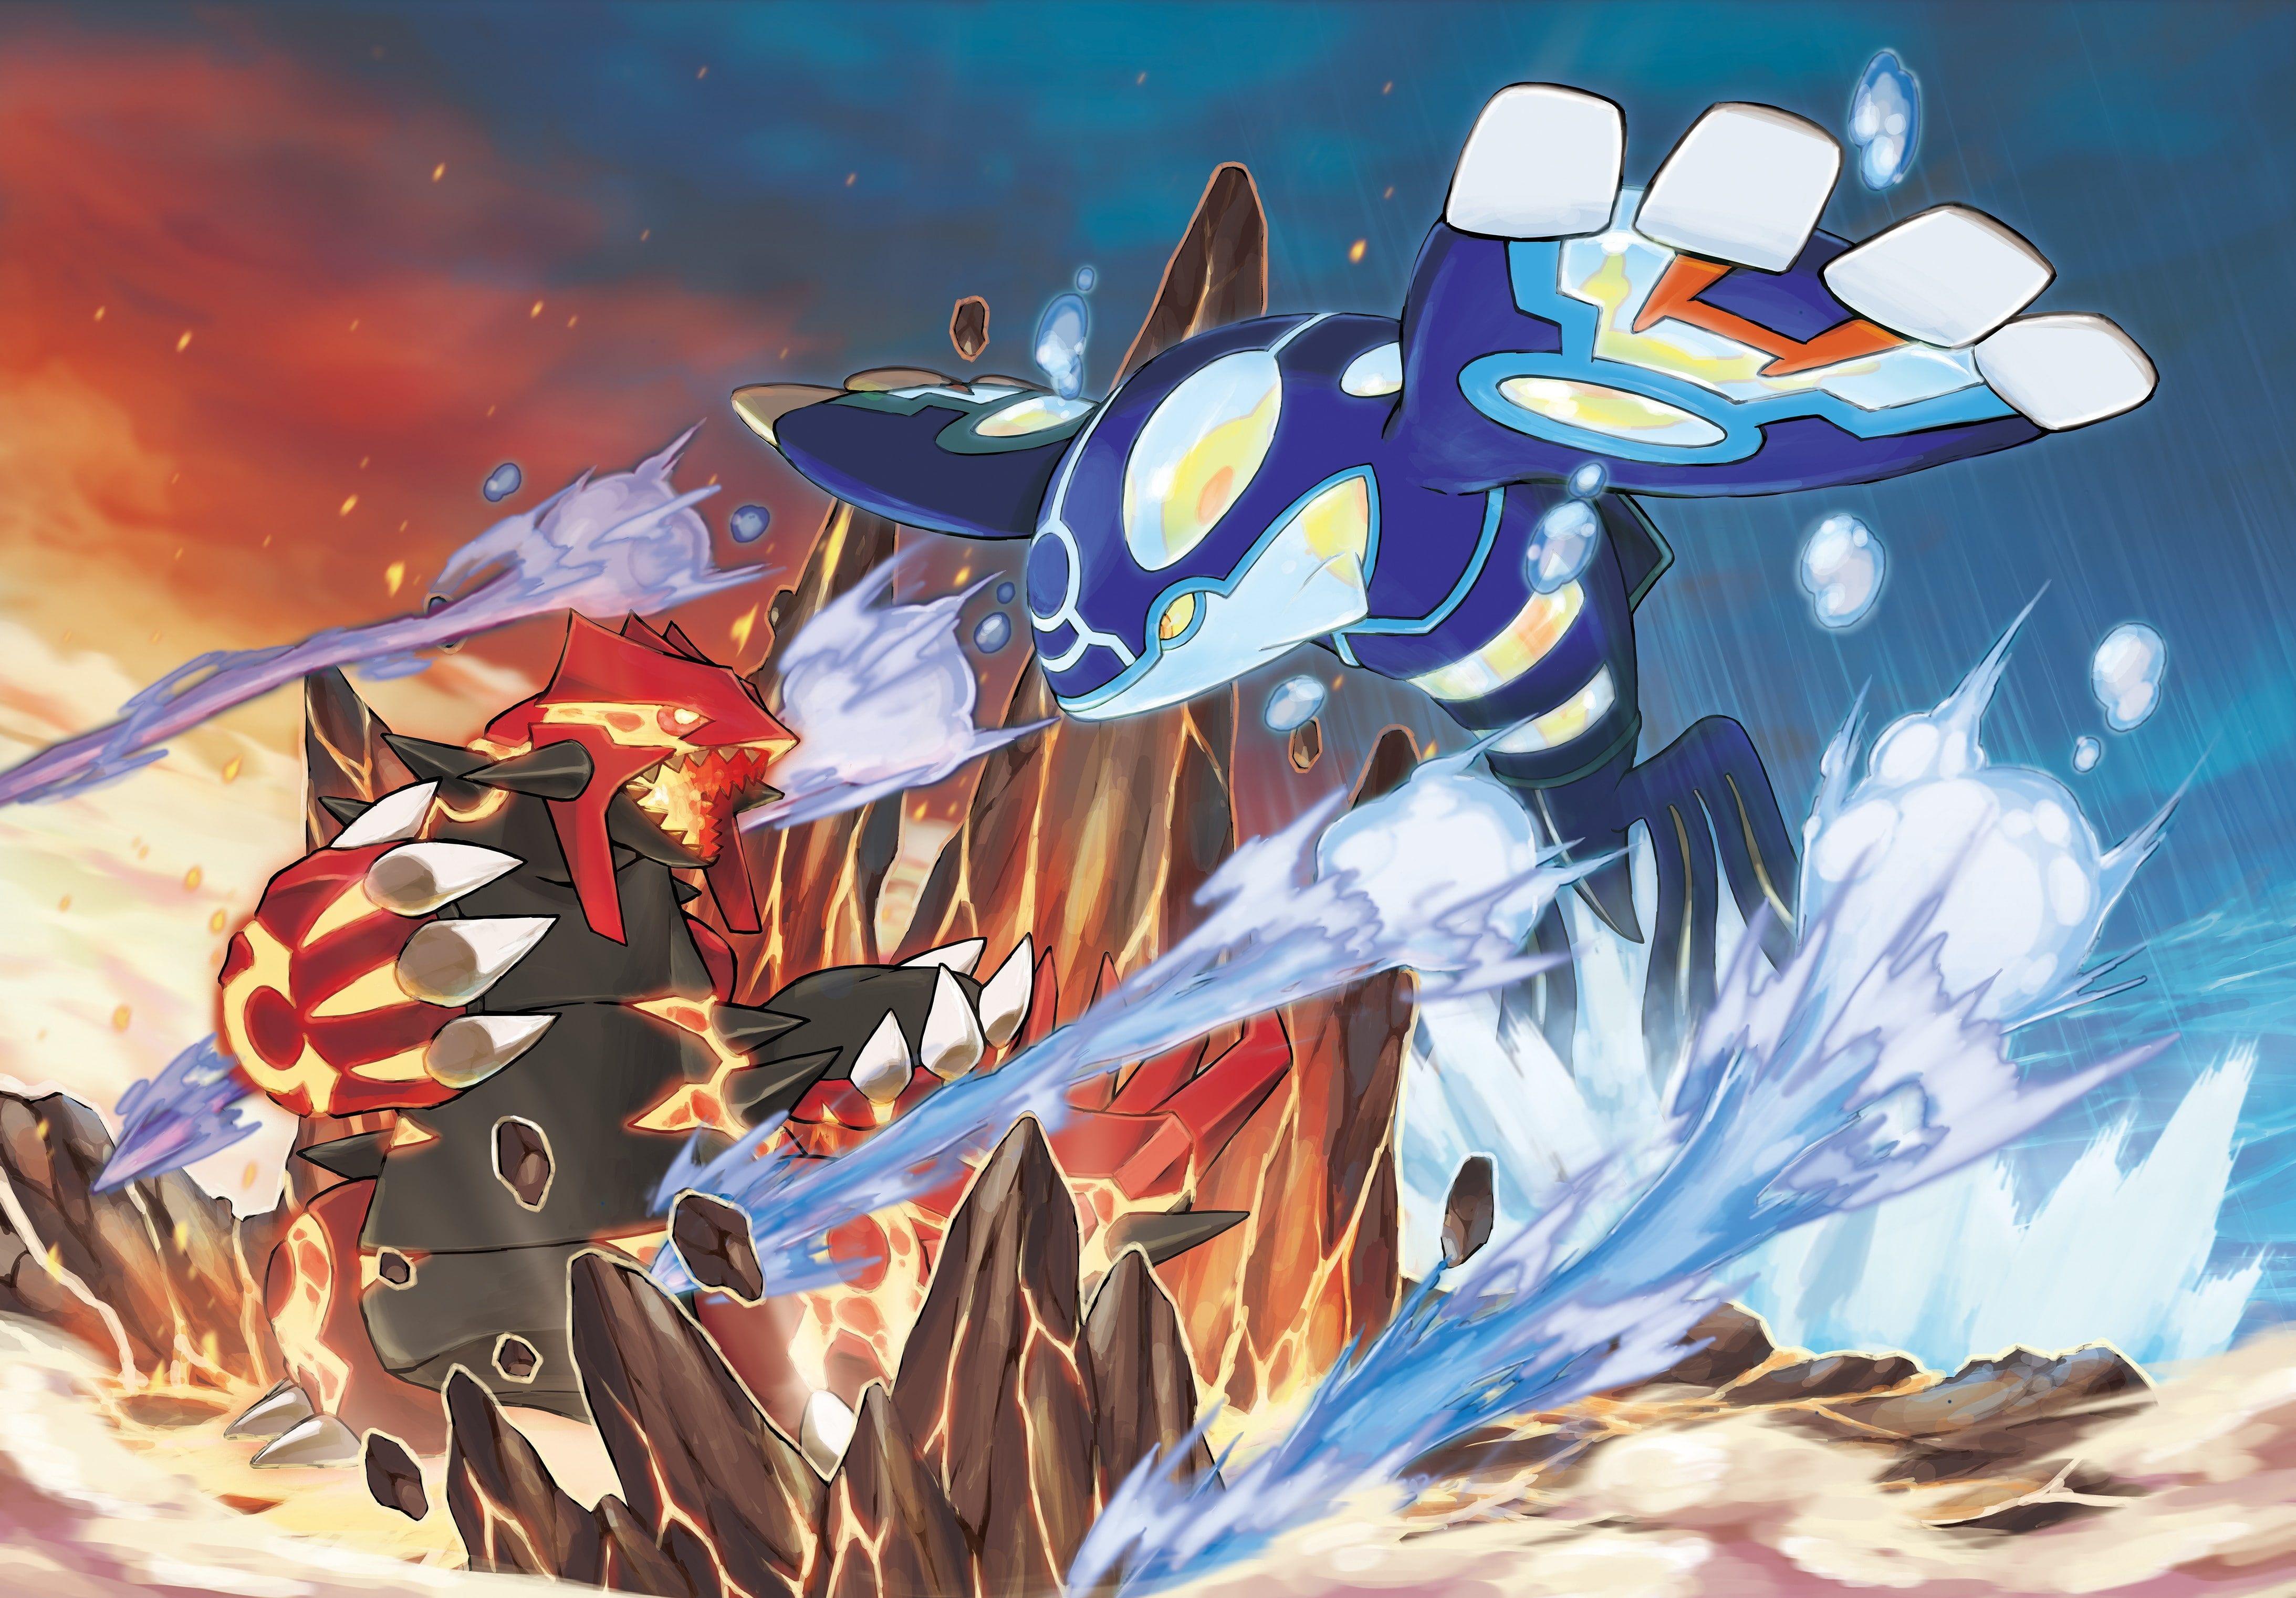 Pokemon Ruby Primal Kyogre Groudon Pokemon Sapphire Pokemon Kyogre Primal Groudon 4k Wallpaper Hdwallpaper Des In 2020 Hd Anime Wallpapers Pokemon Pokemon Alpha